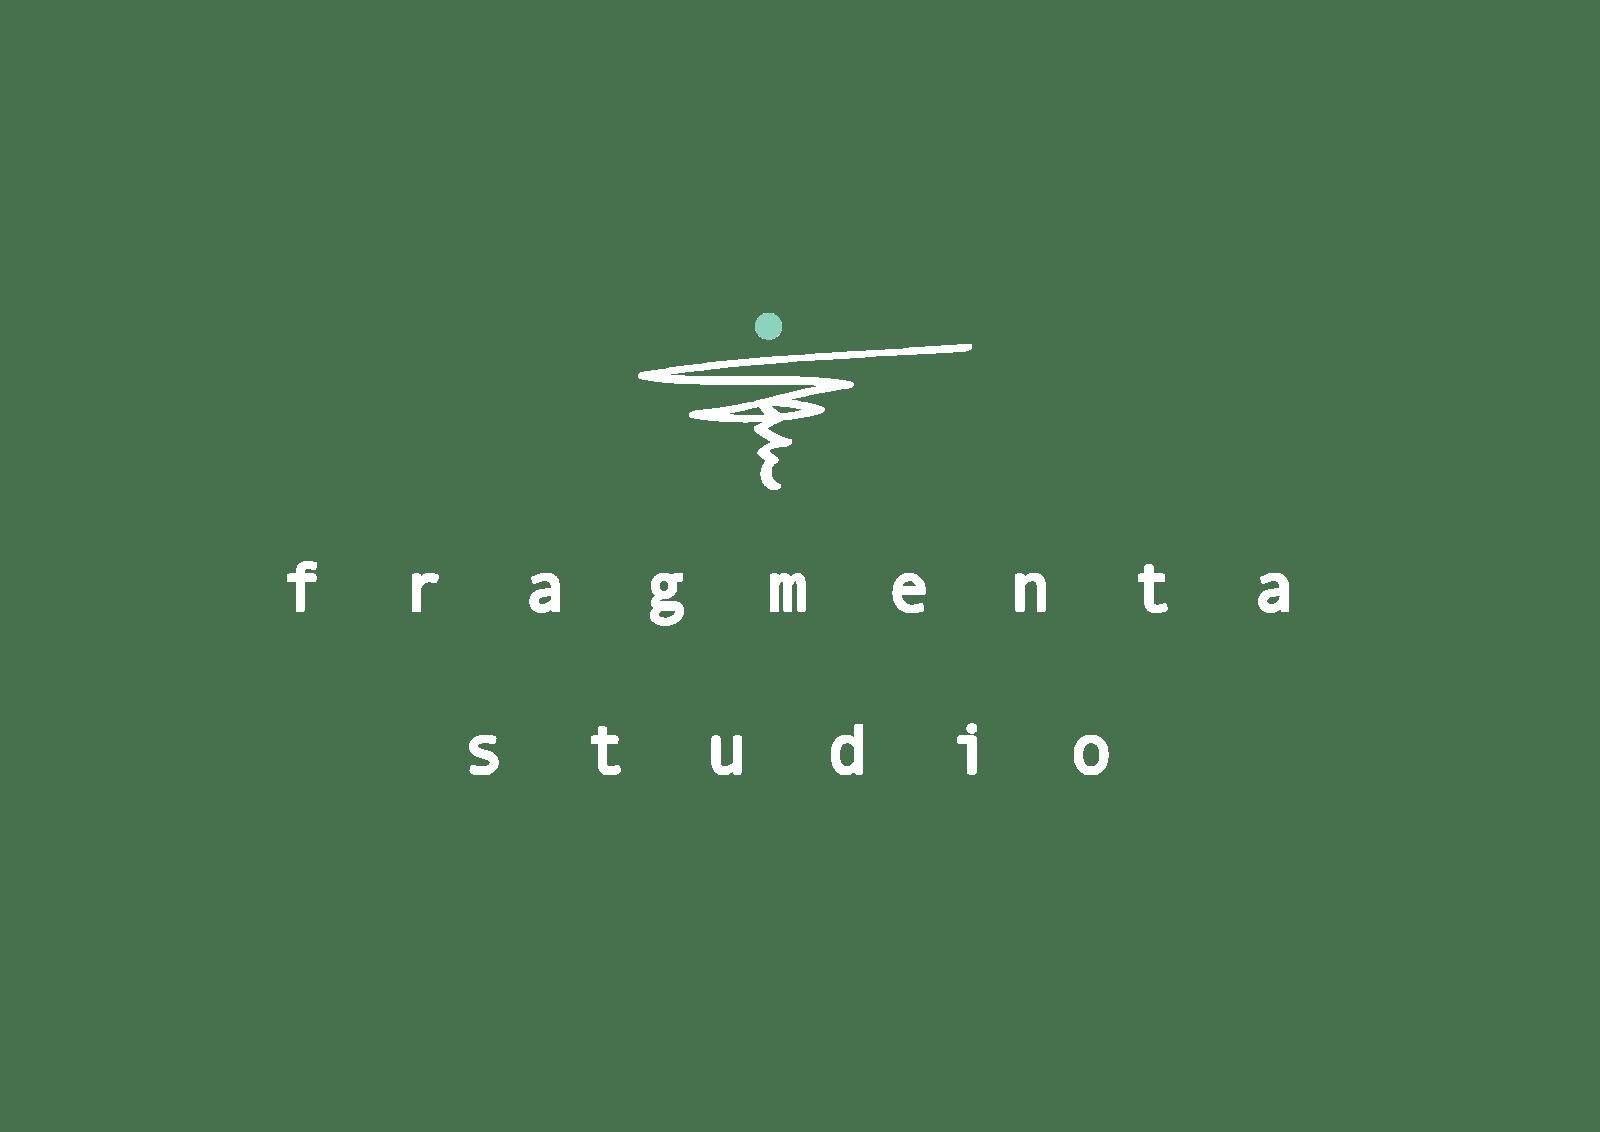 FragmentaStudio